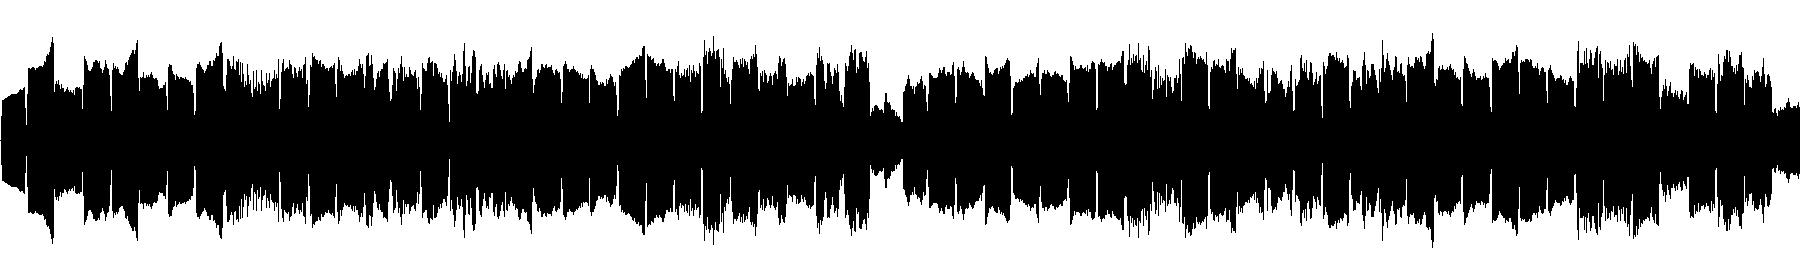 90 c 8